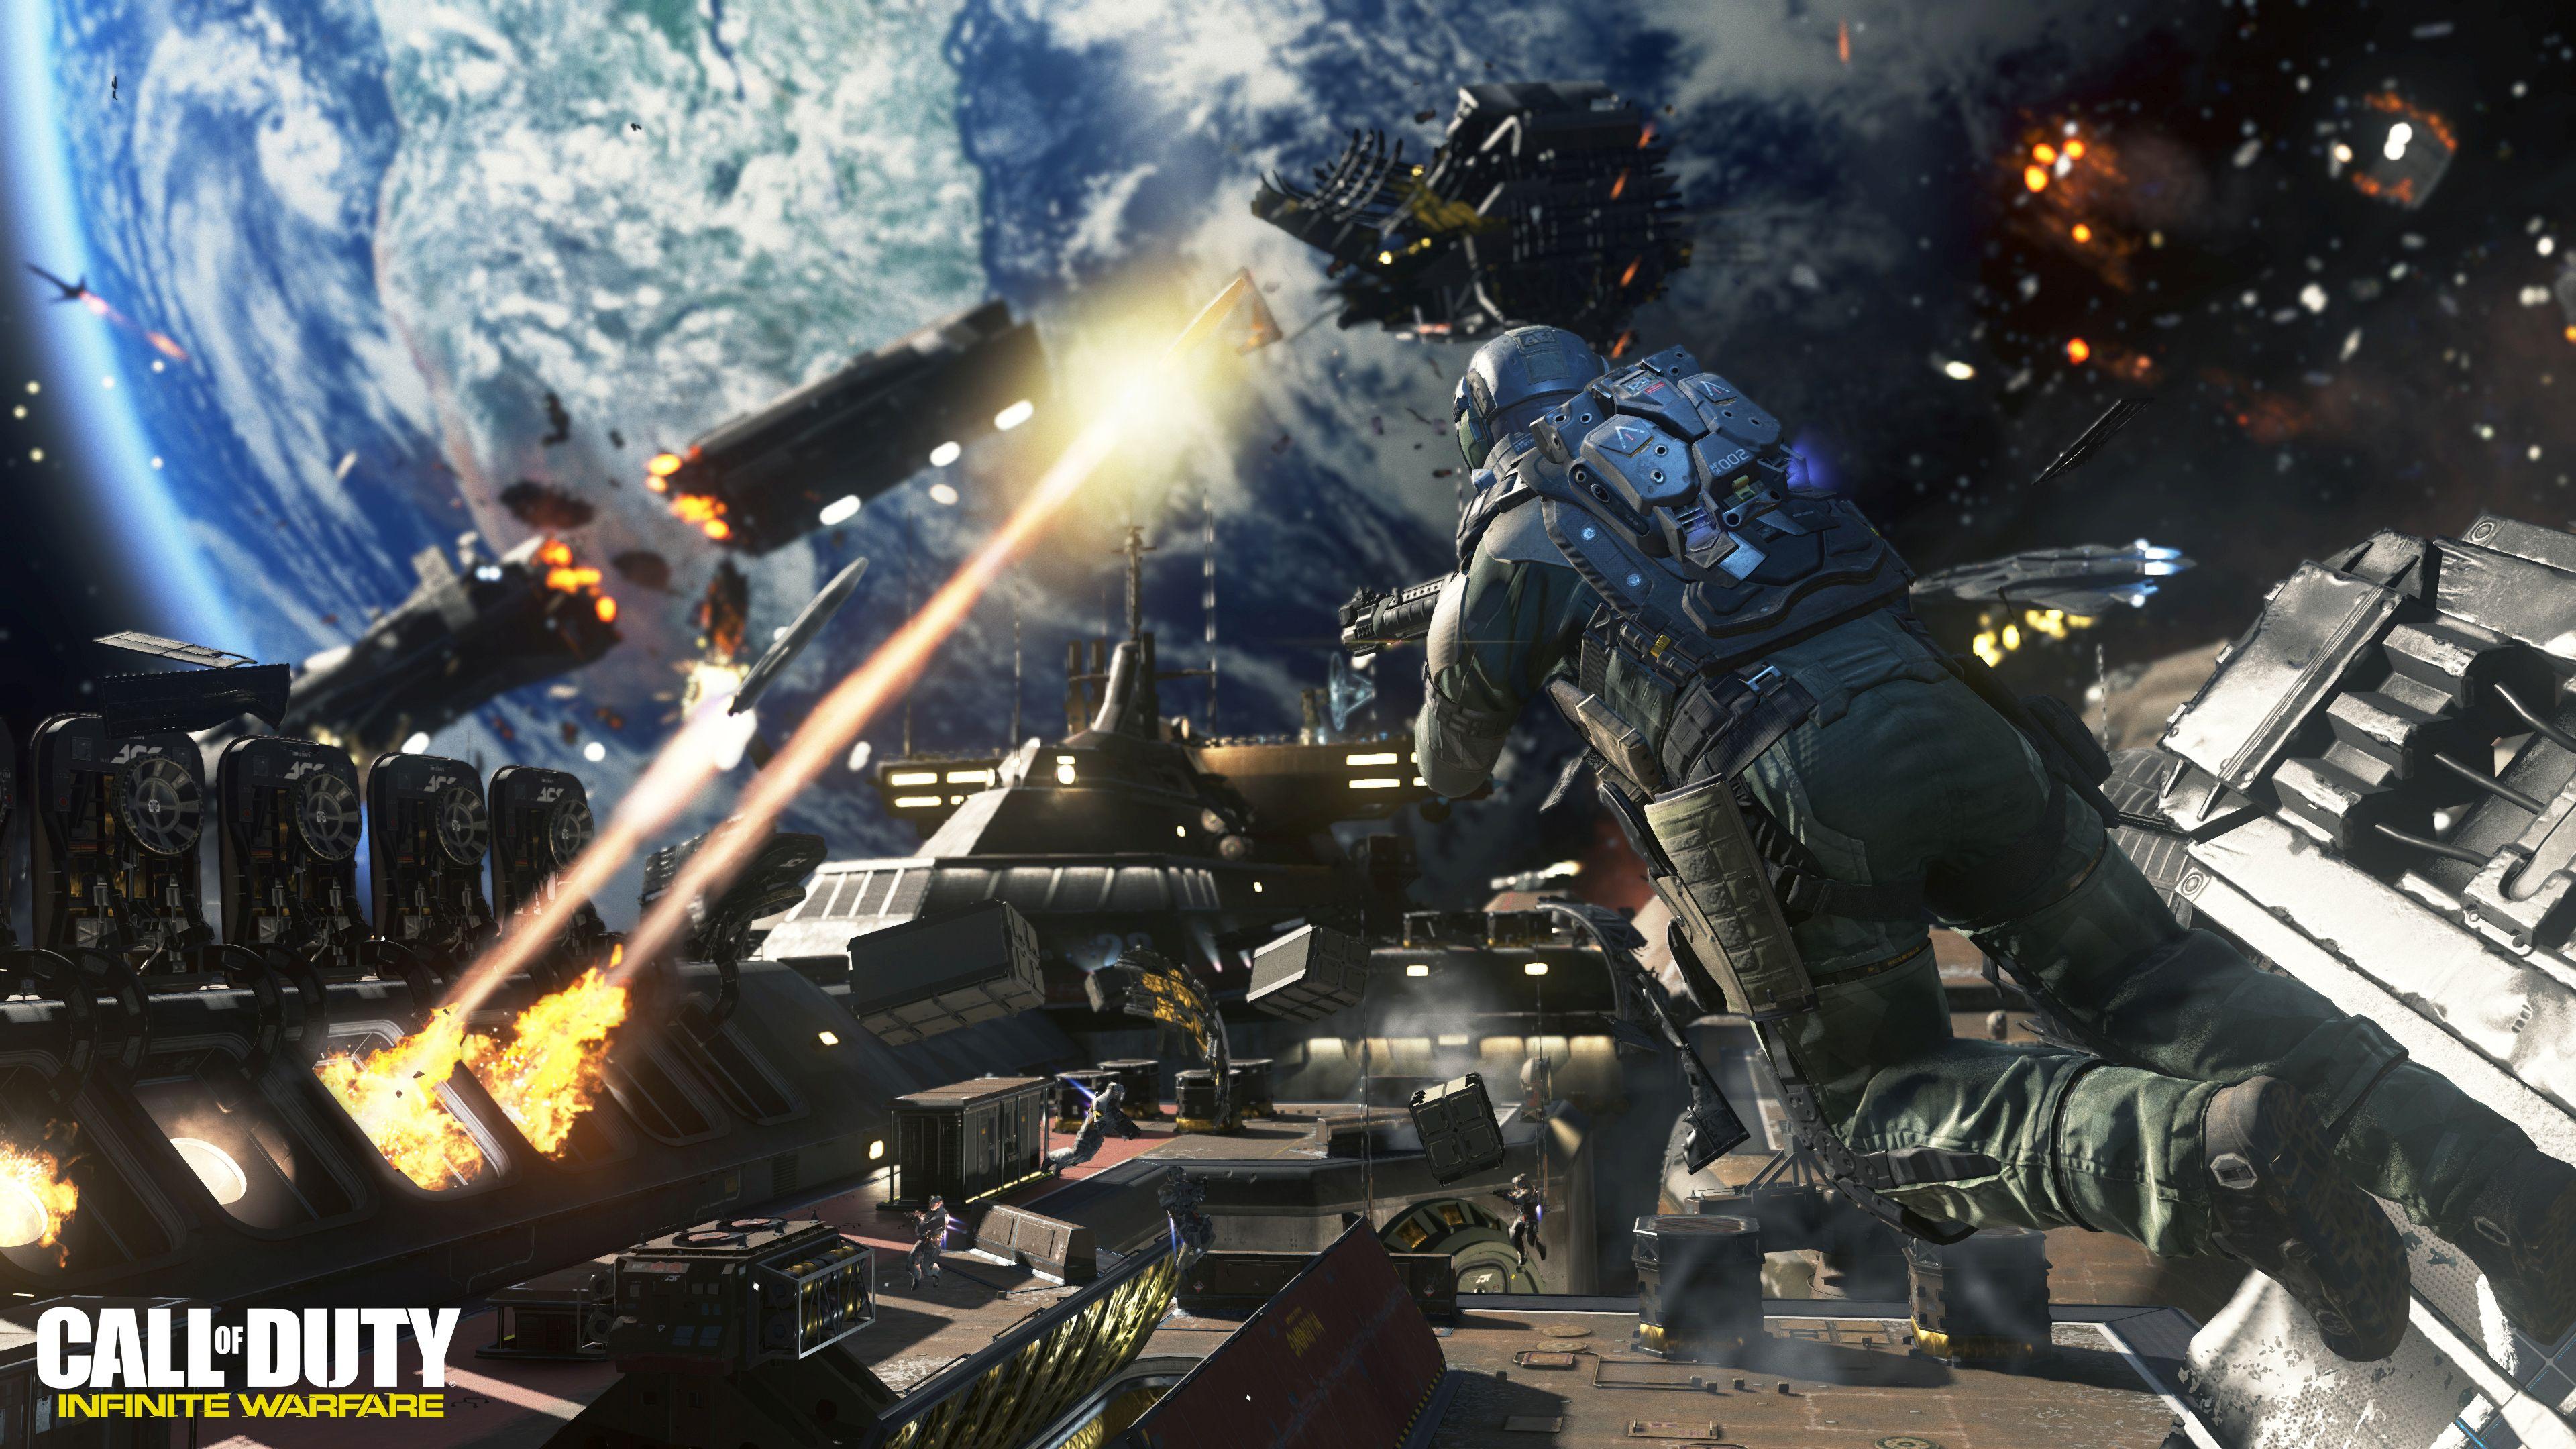 Call Of Duty Infinite Warfare Screenshots And Space Gameplay Feed4gamers